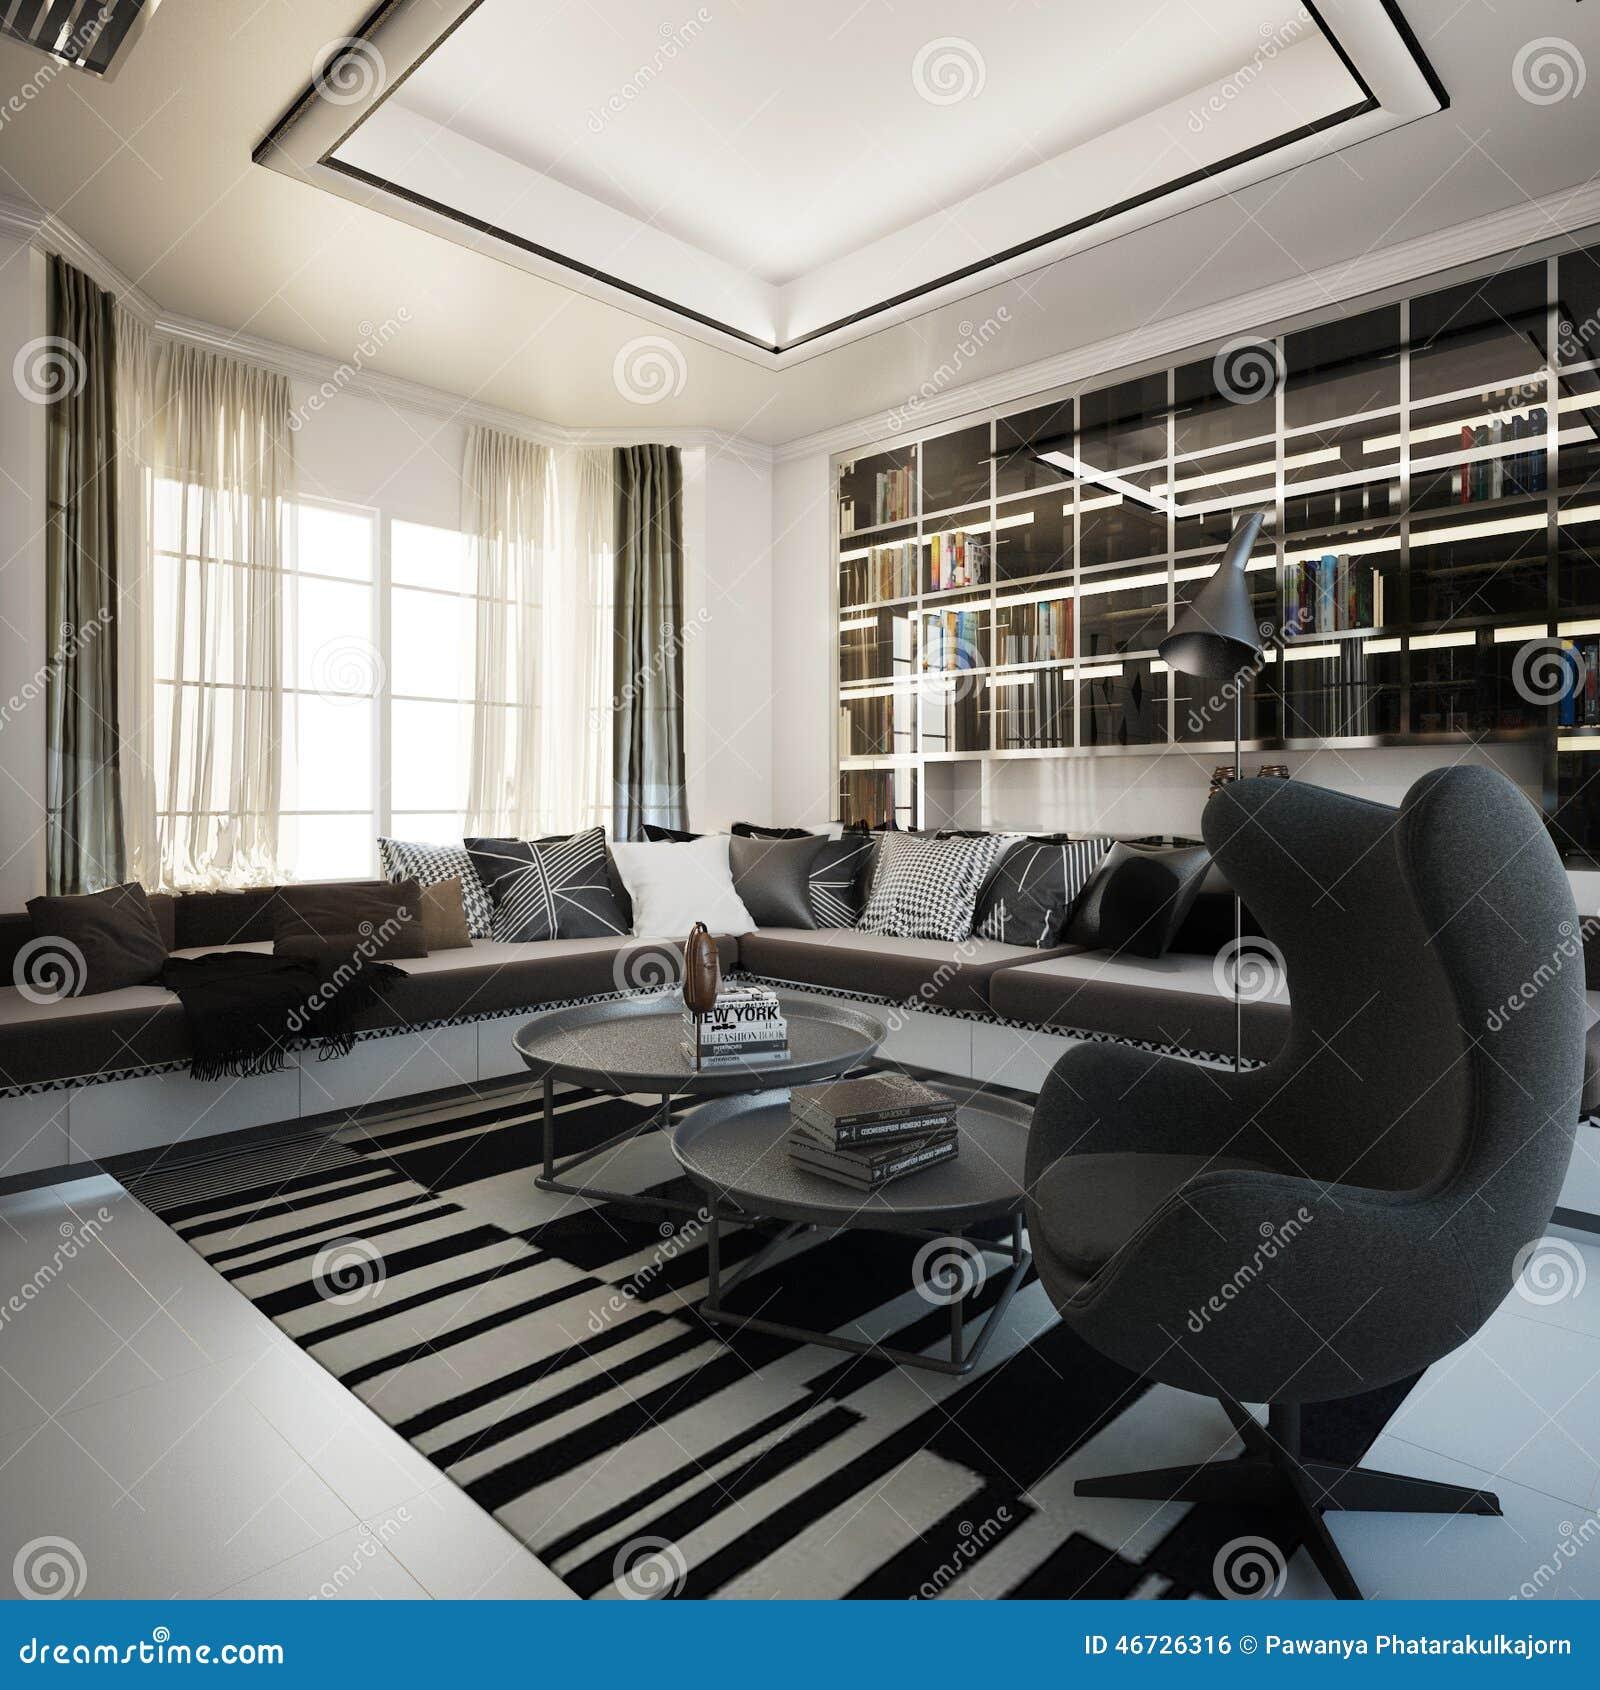 Living area interior design stock illustration image for Living area interior design